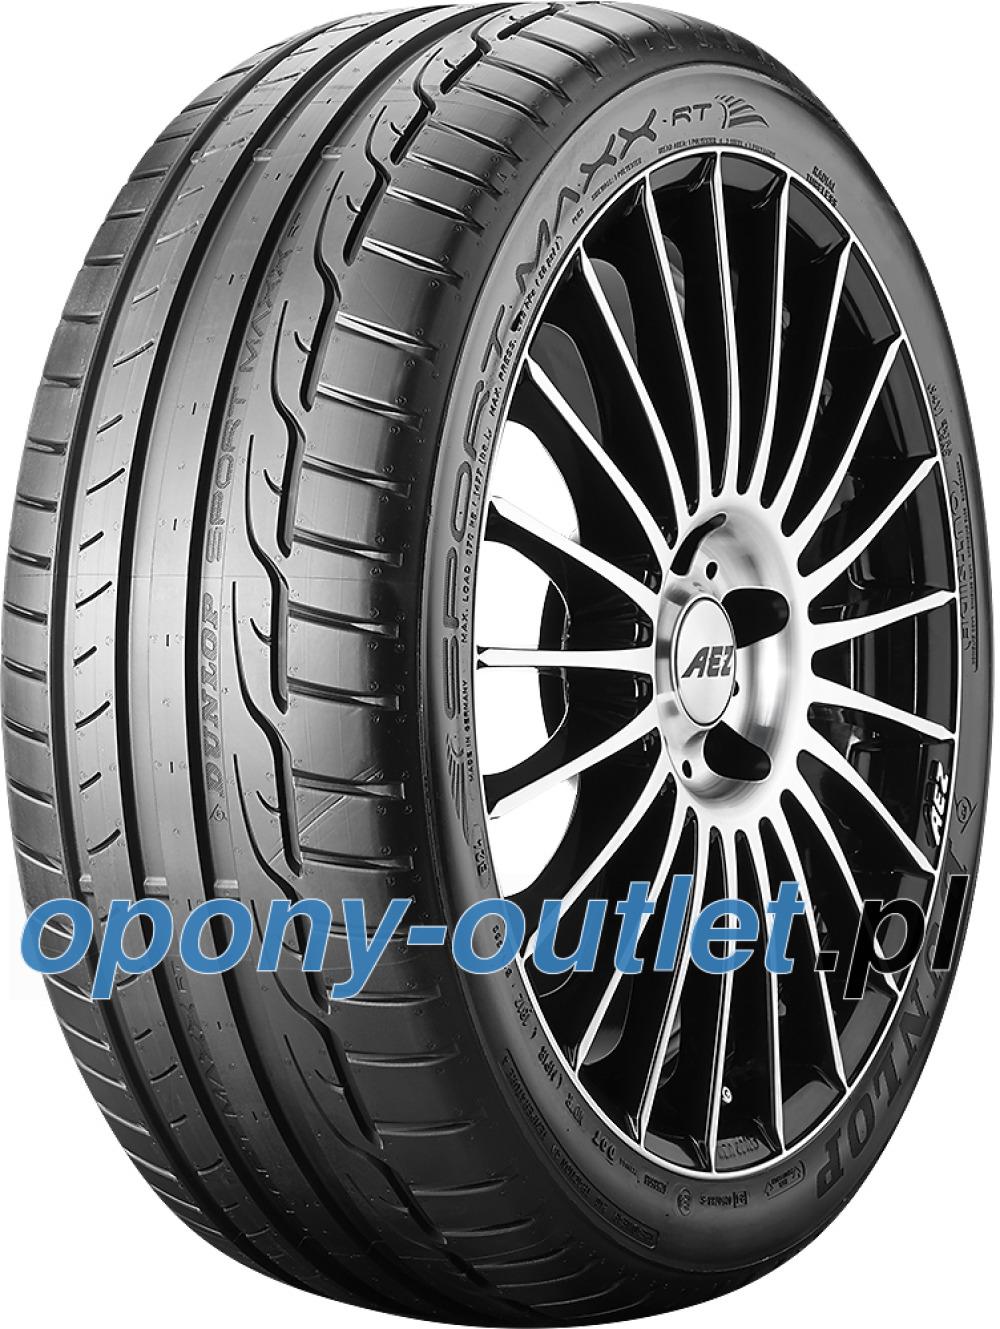 Dunlop Sport Maxx RT ( 215/55 R16 93Y osłona felgi (MFS) )